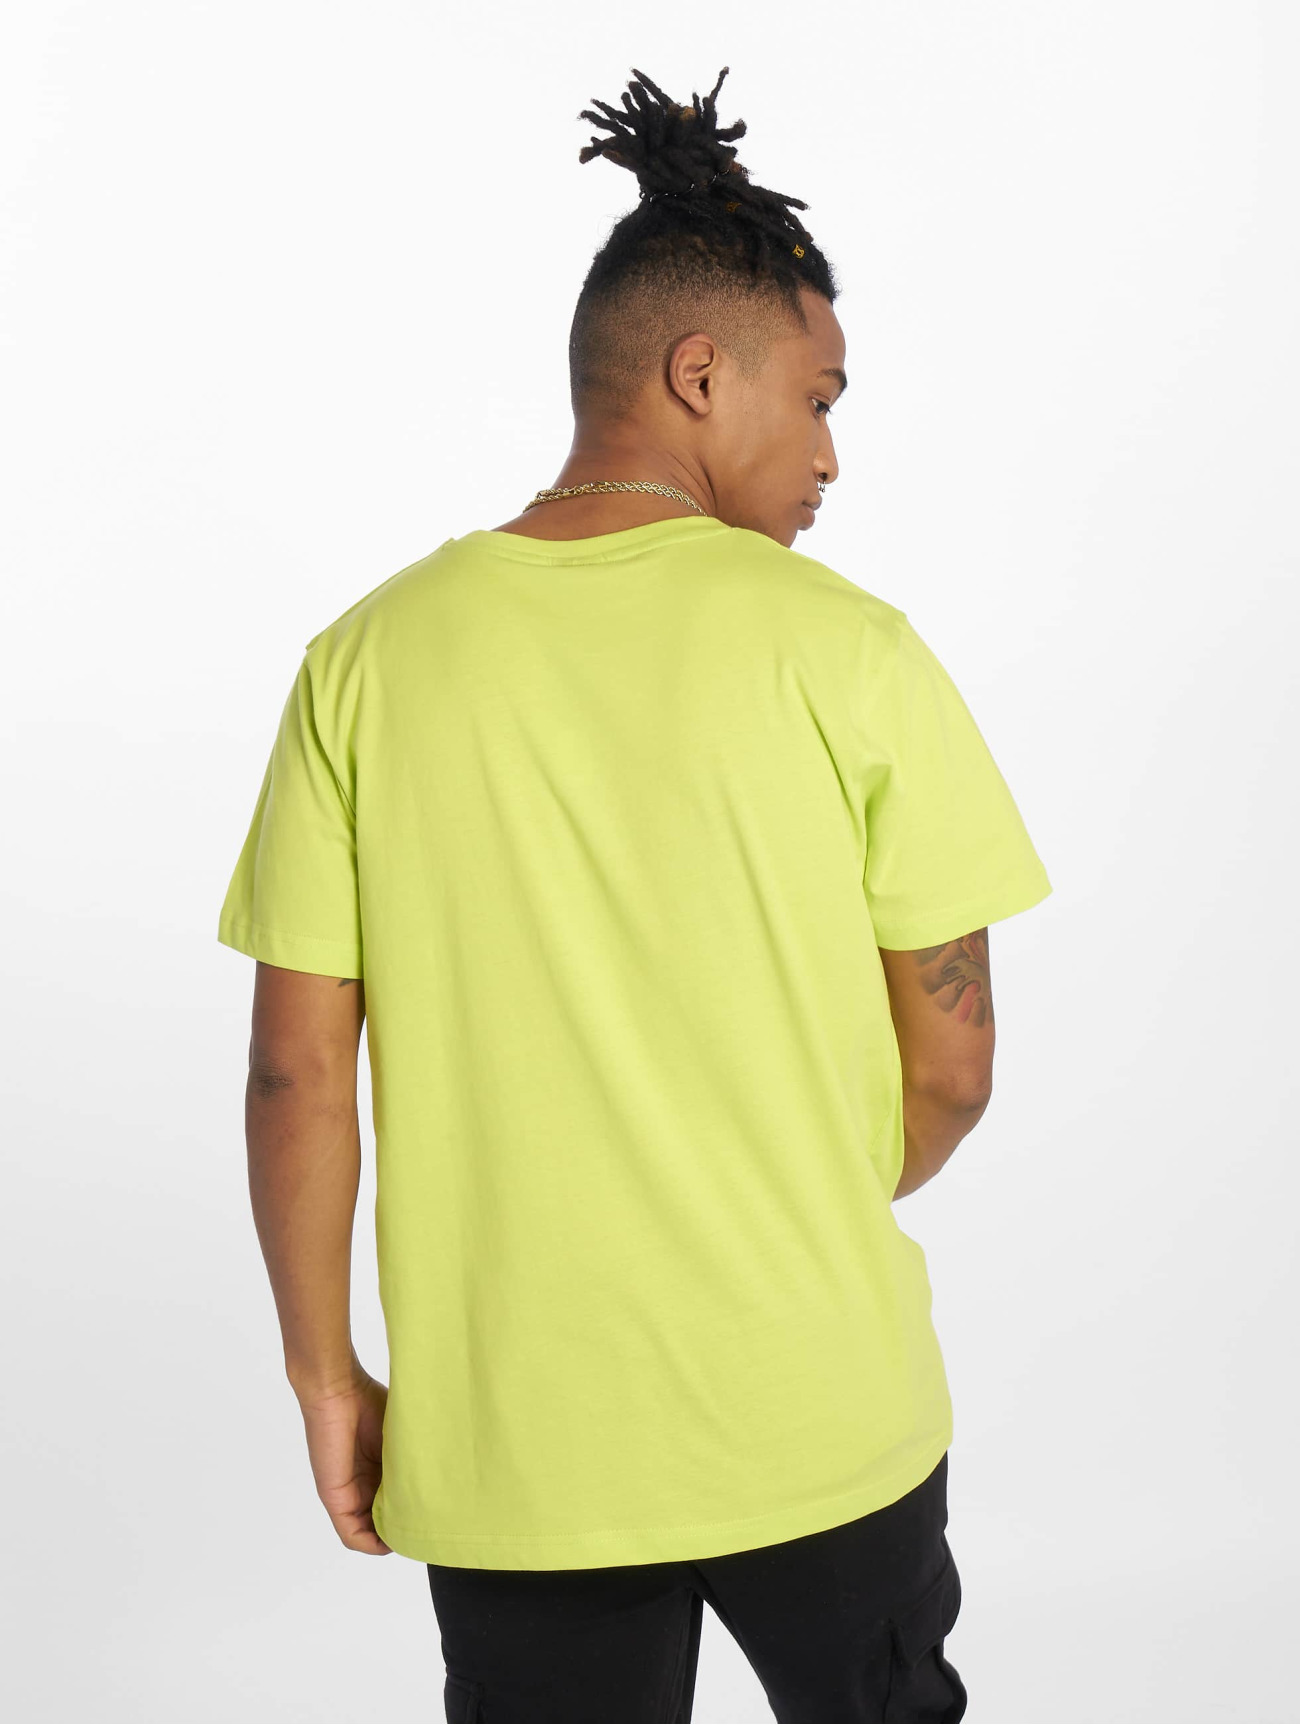 Mister Tee | Konichiwa   jaune Homme T-Shirt  543224| Homme Hauts